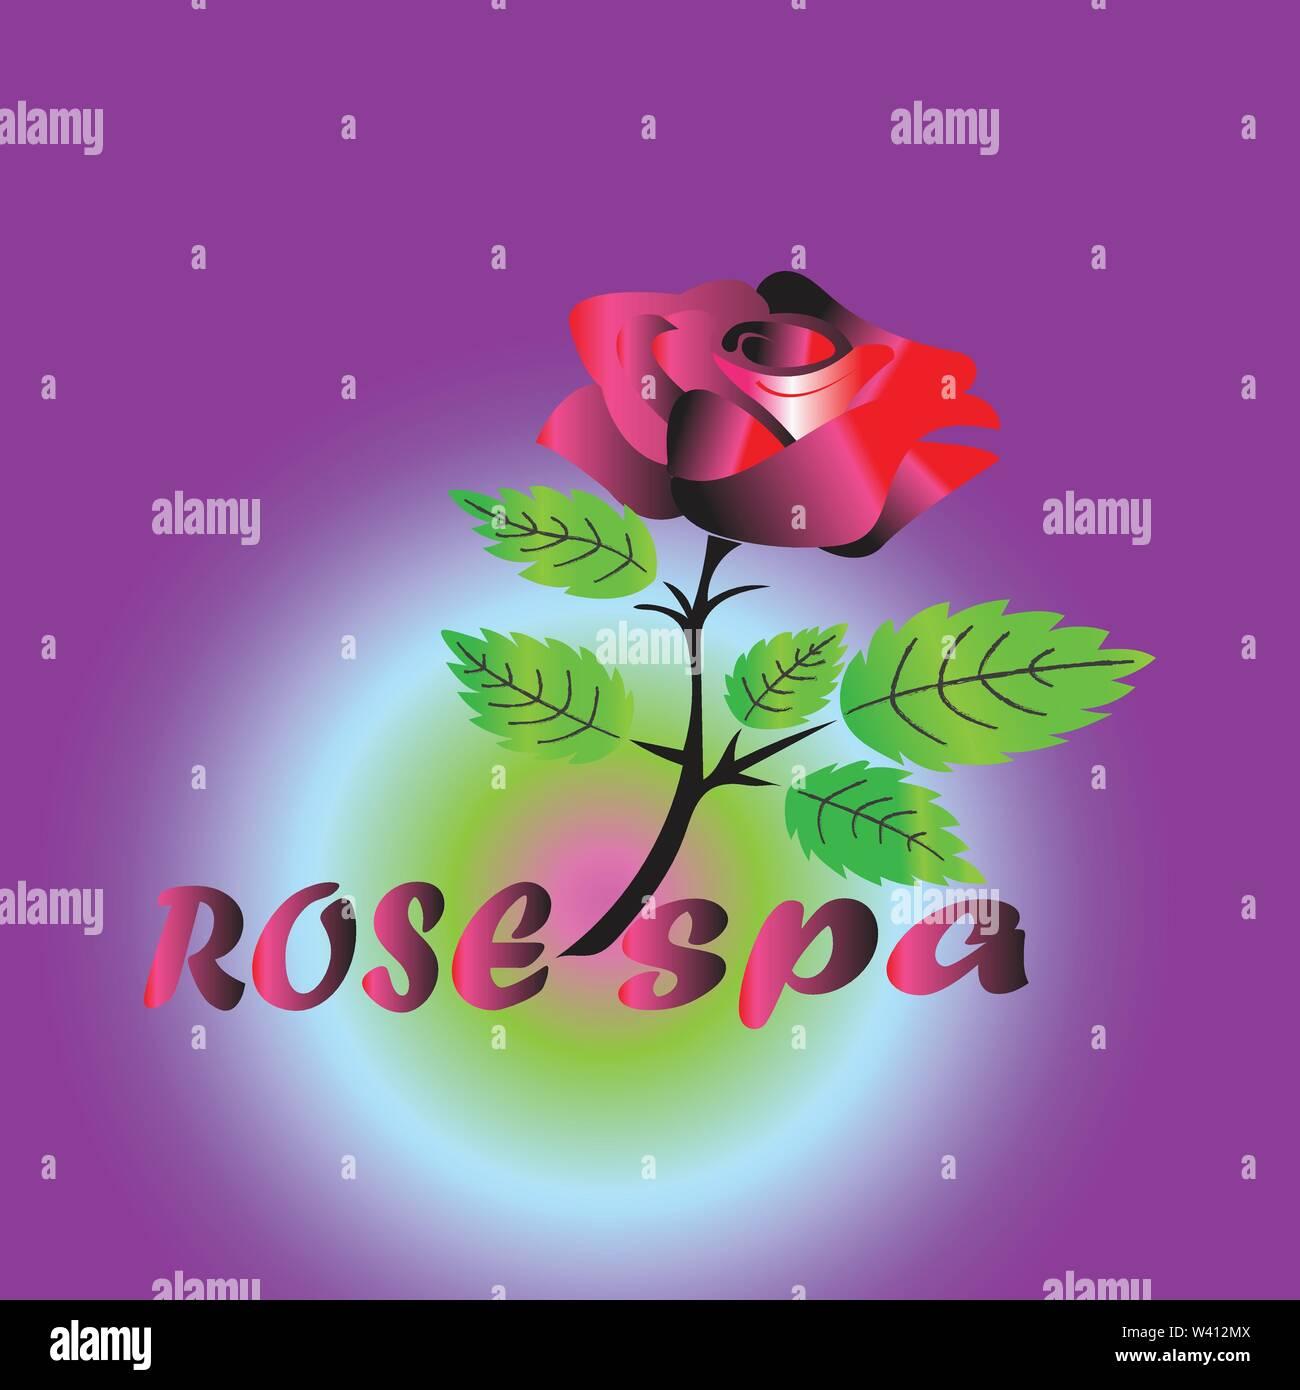 Logotipo de spa con rosa roja, aislados con fondo violeta Imagen De Stock